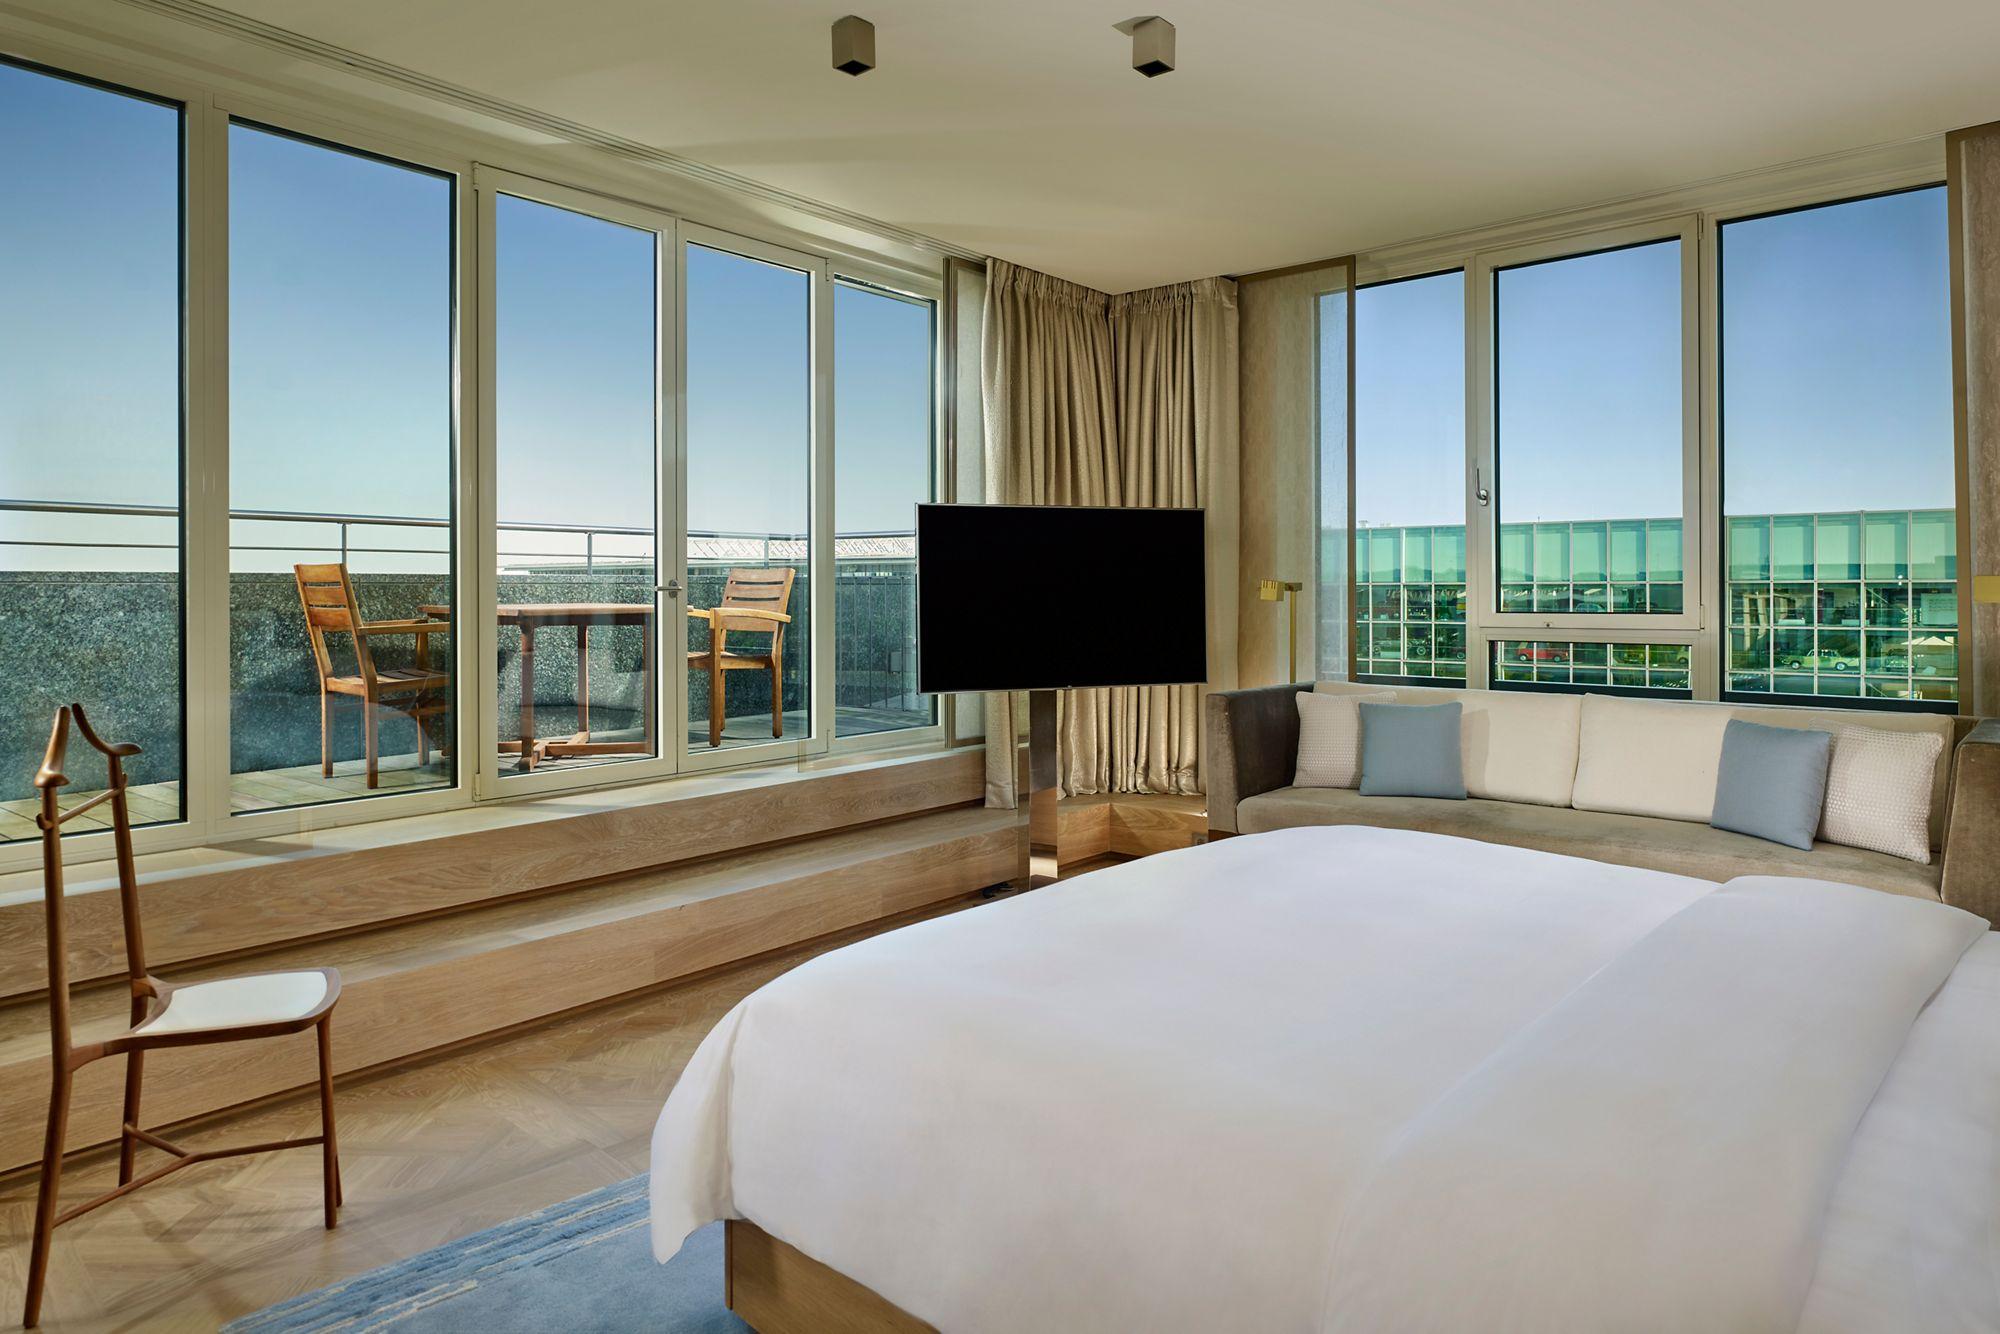 Black & White Two-Bedroom Suite | The Ritz-Carlton, Wolfsburg